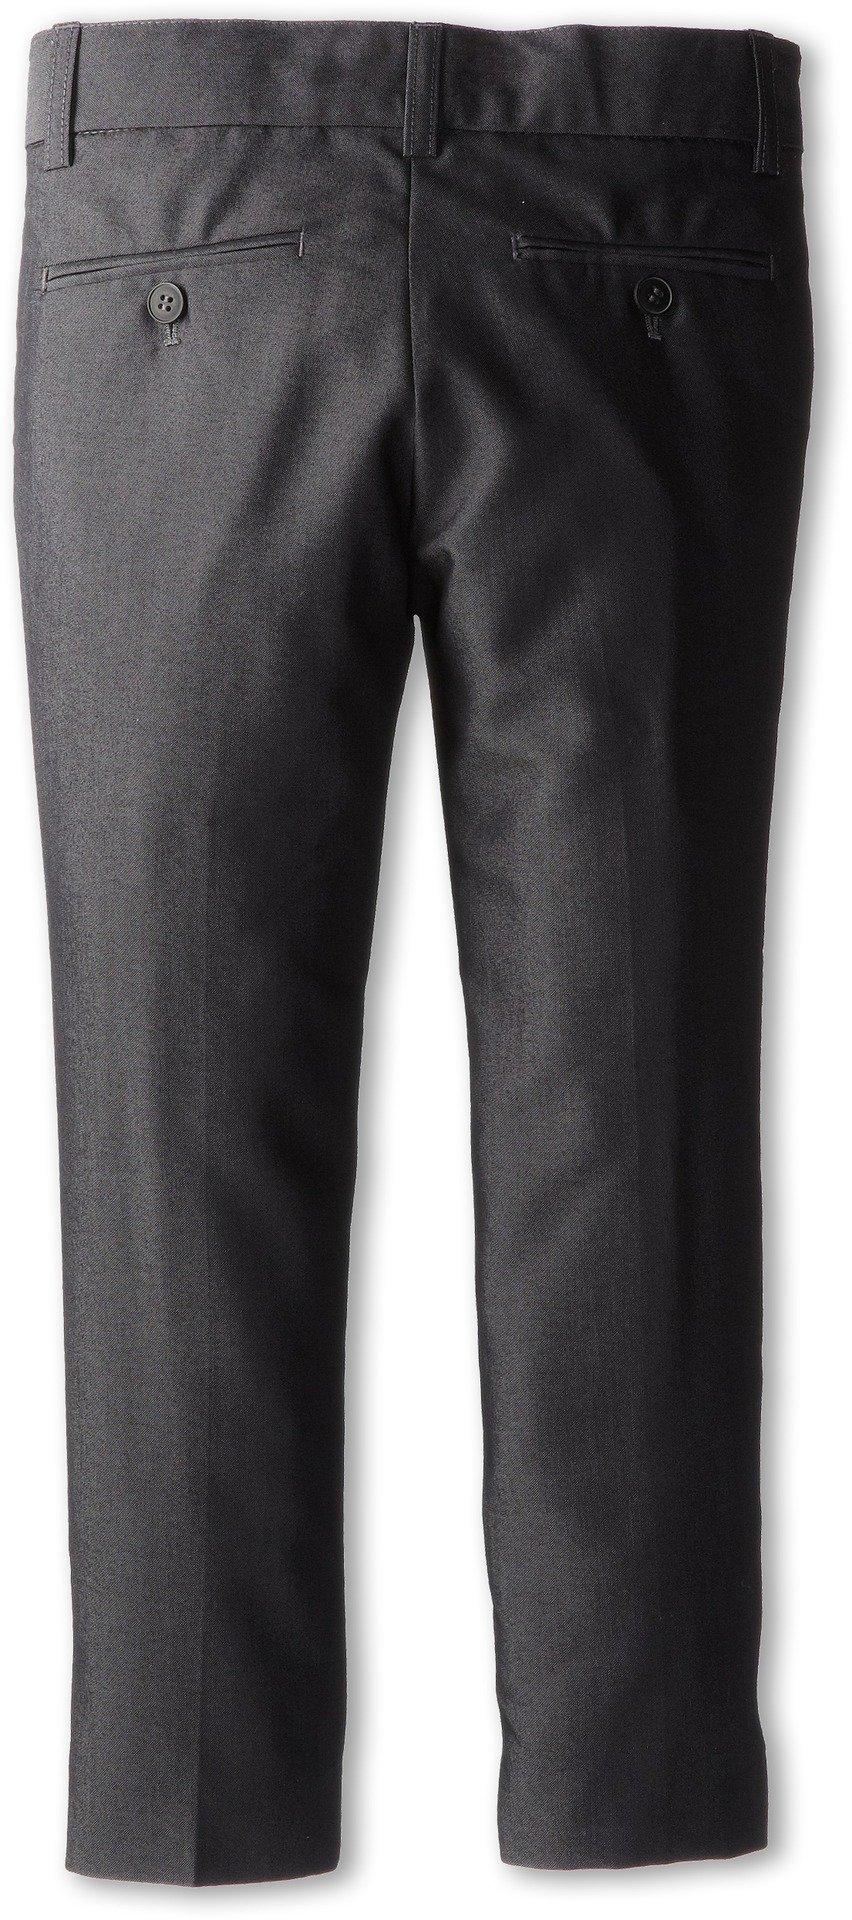 Appaman Little Boys' Mod Suit Pants, Vintage Black, 7 by Appaman (Image #2)